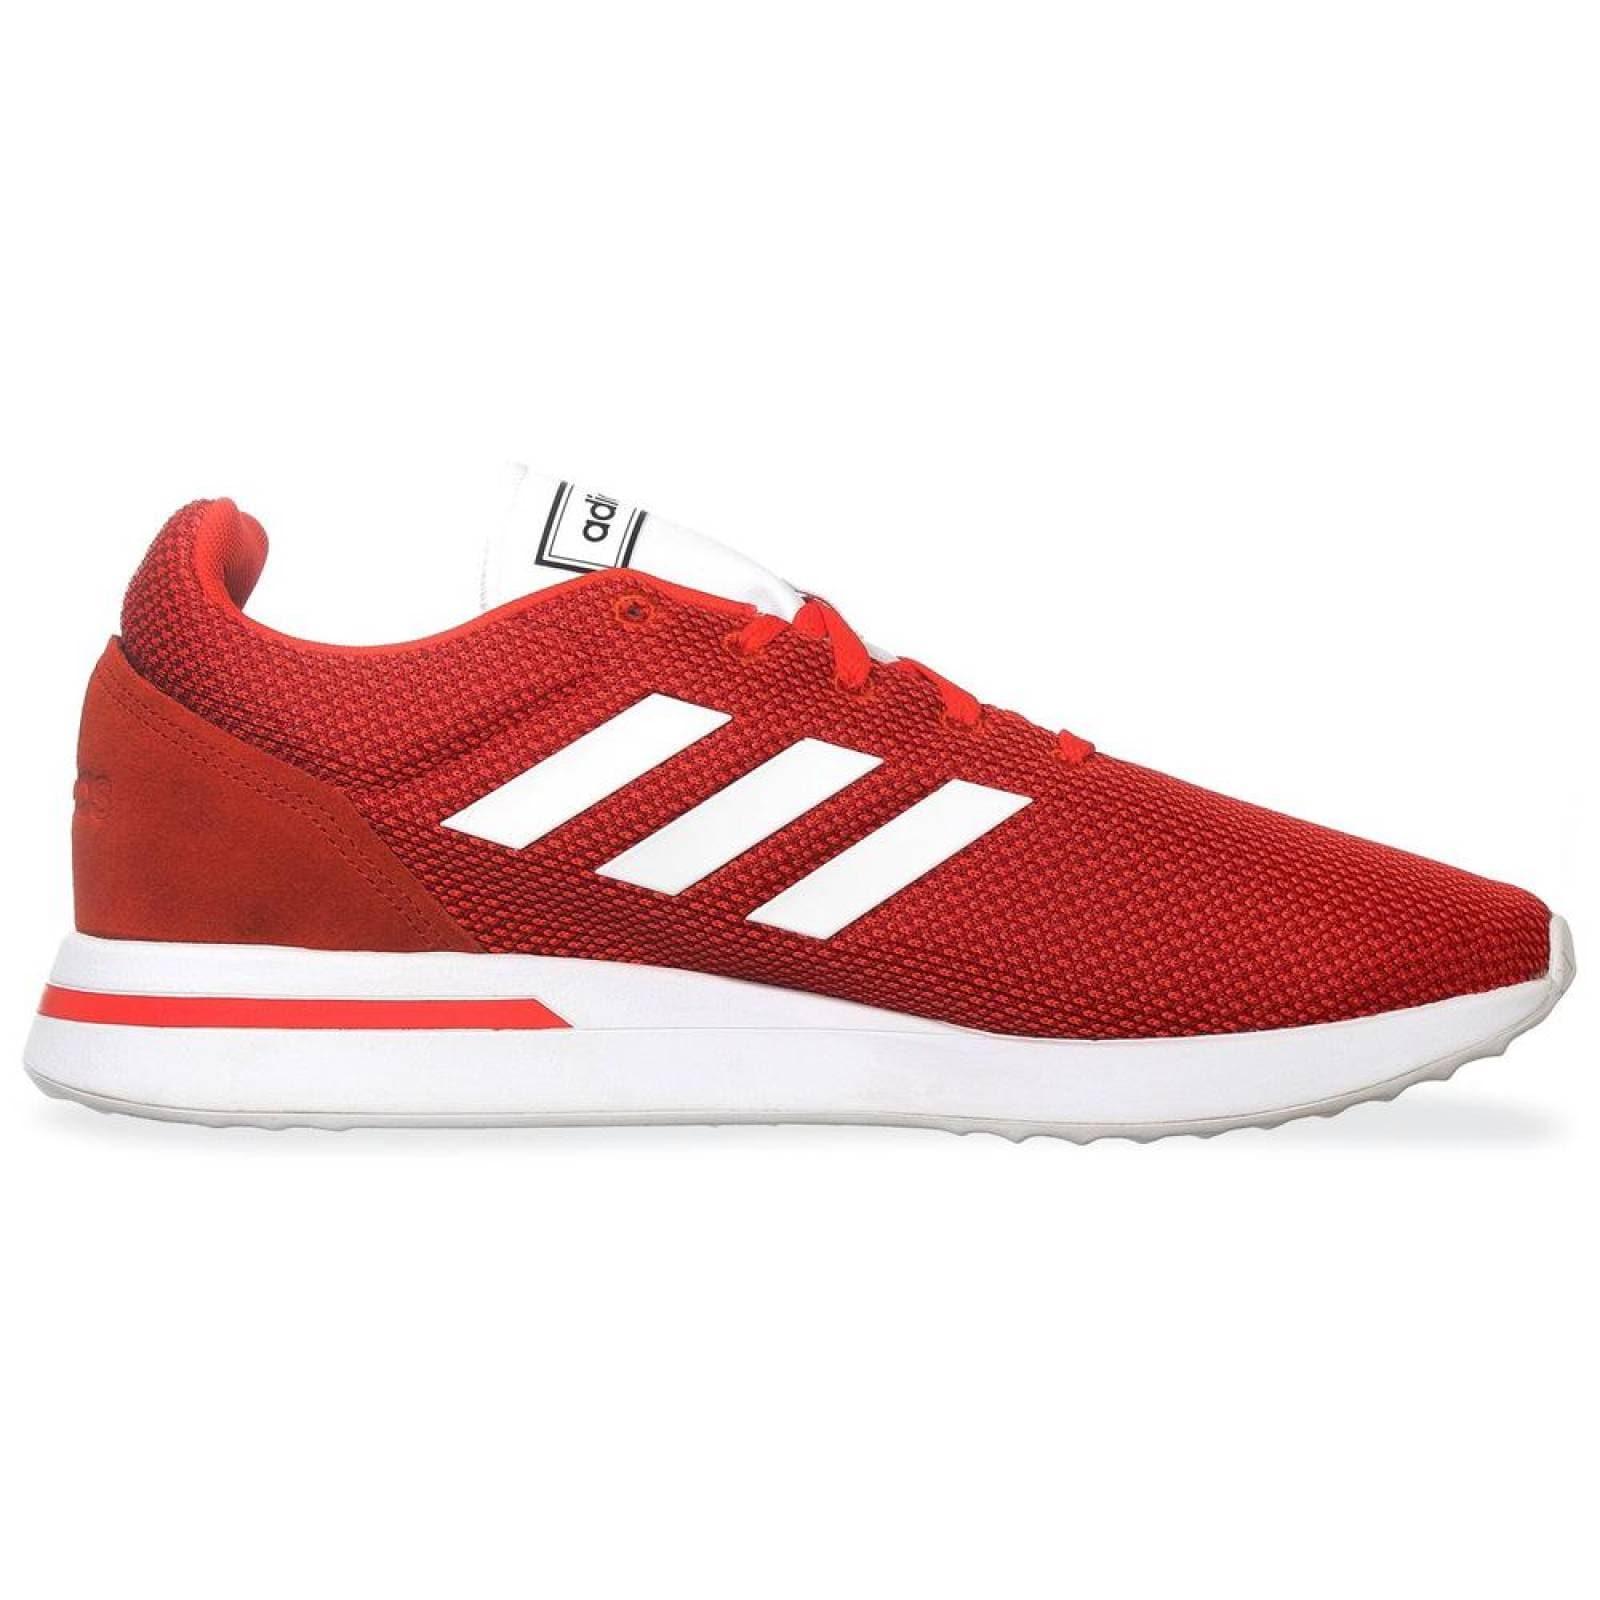 Tenis Adidas Run70s B96556 Rojo Hombre